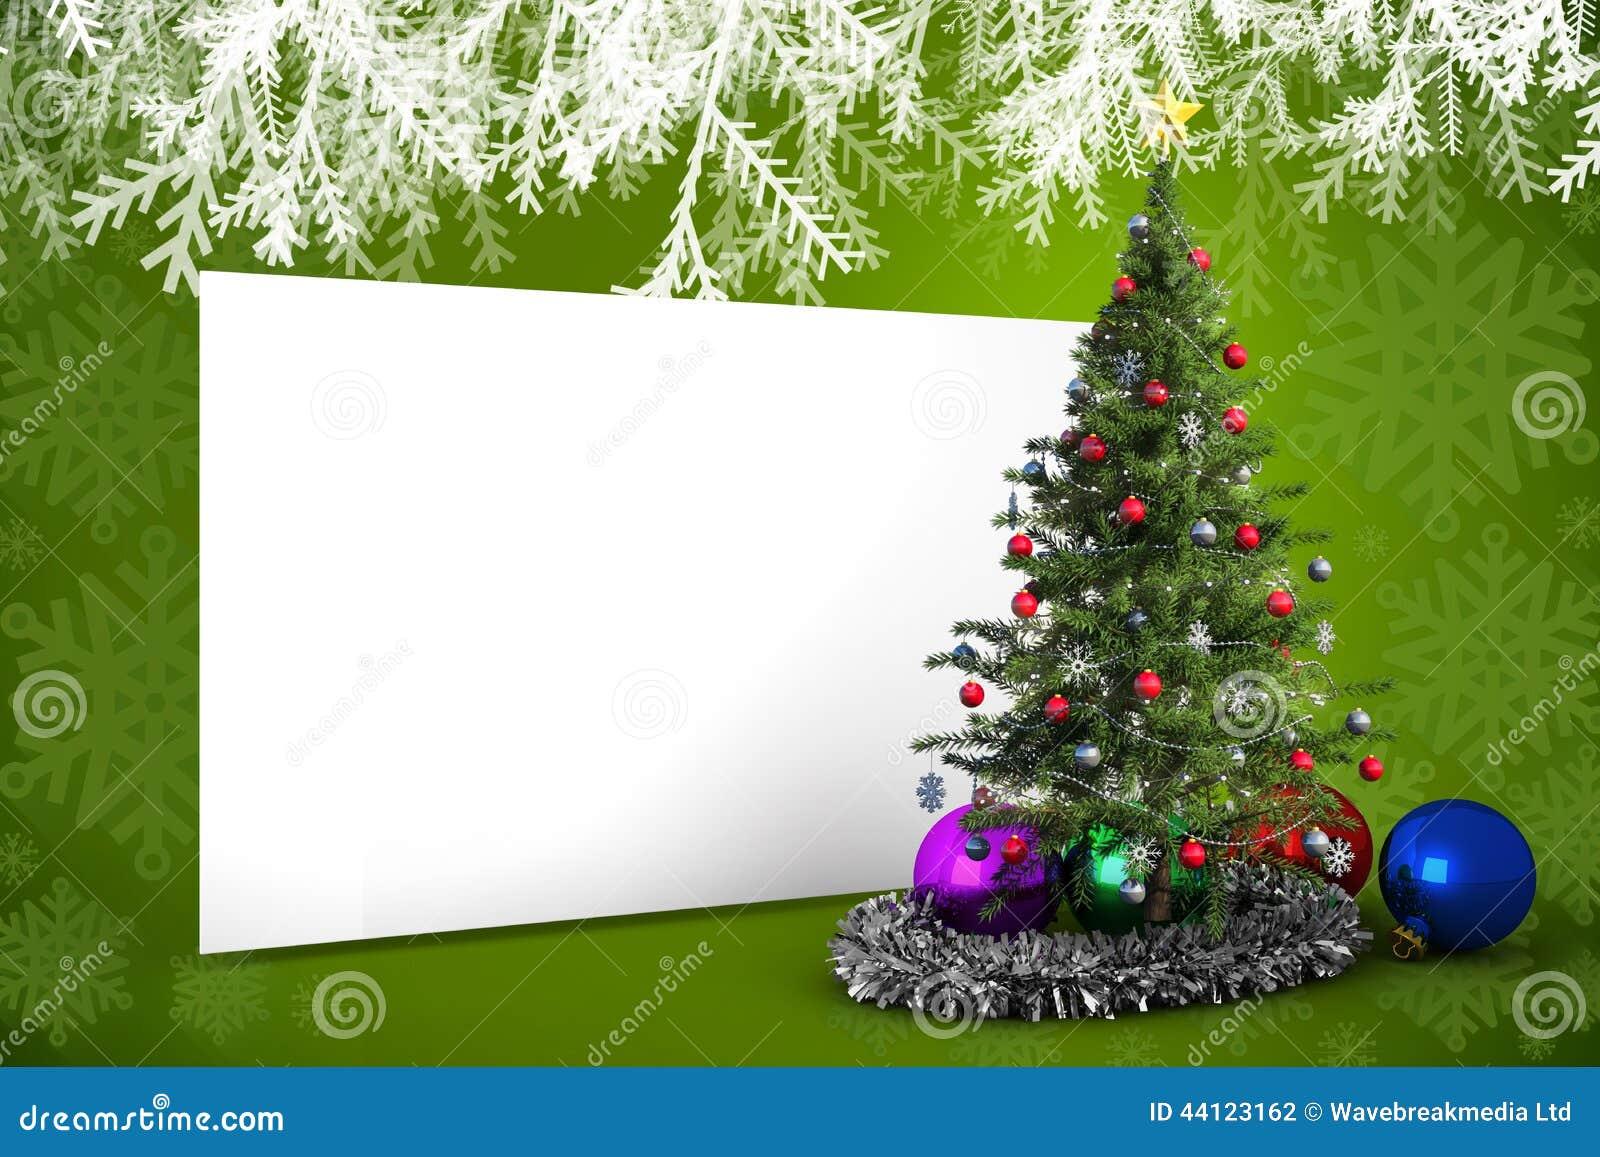 image compos e d 39 affiche avec l 39 arbre de no l illustration stock illustration du babioles. Black Bedroom Furniture Sets. Home Design Ideas